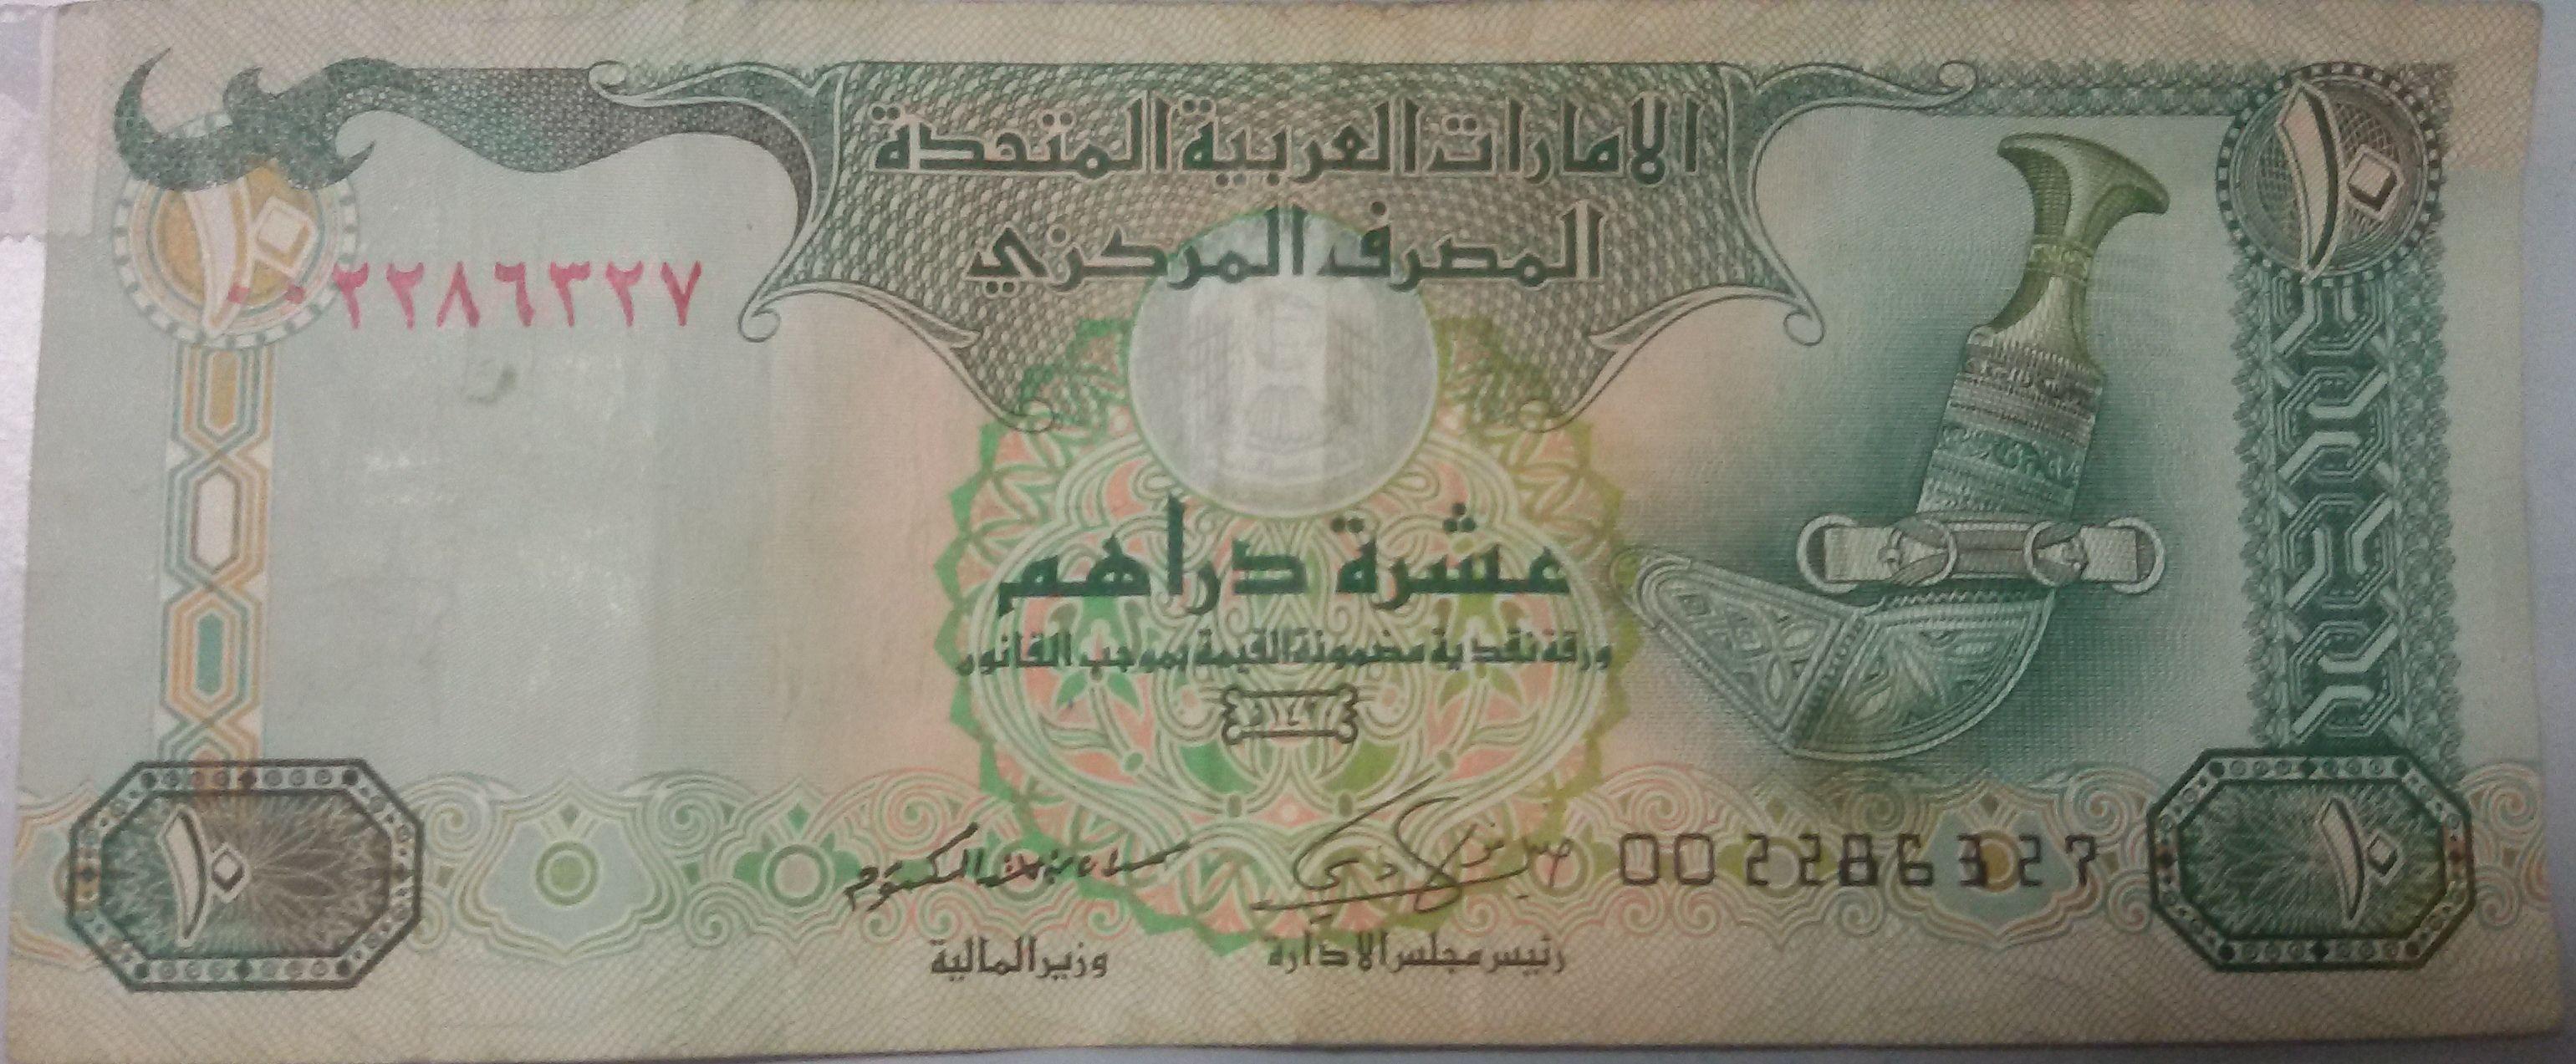 Uae currency 5 dirham numismatics pinterest uae biocorpaavc